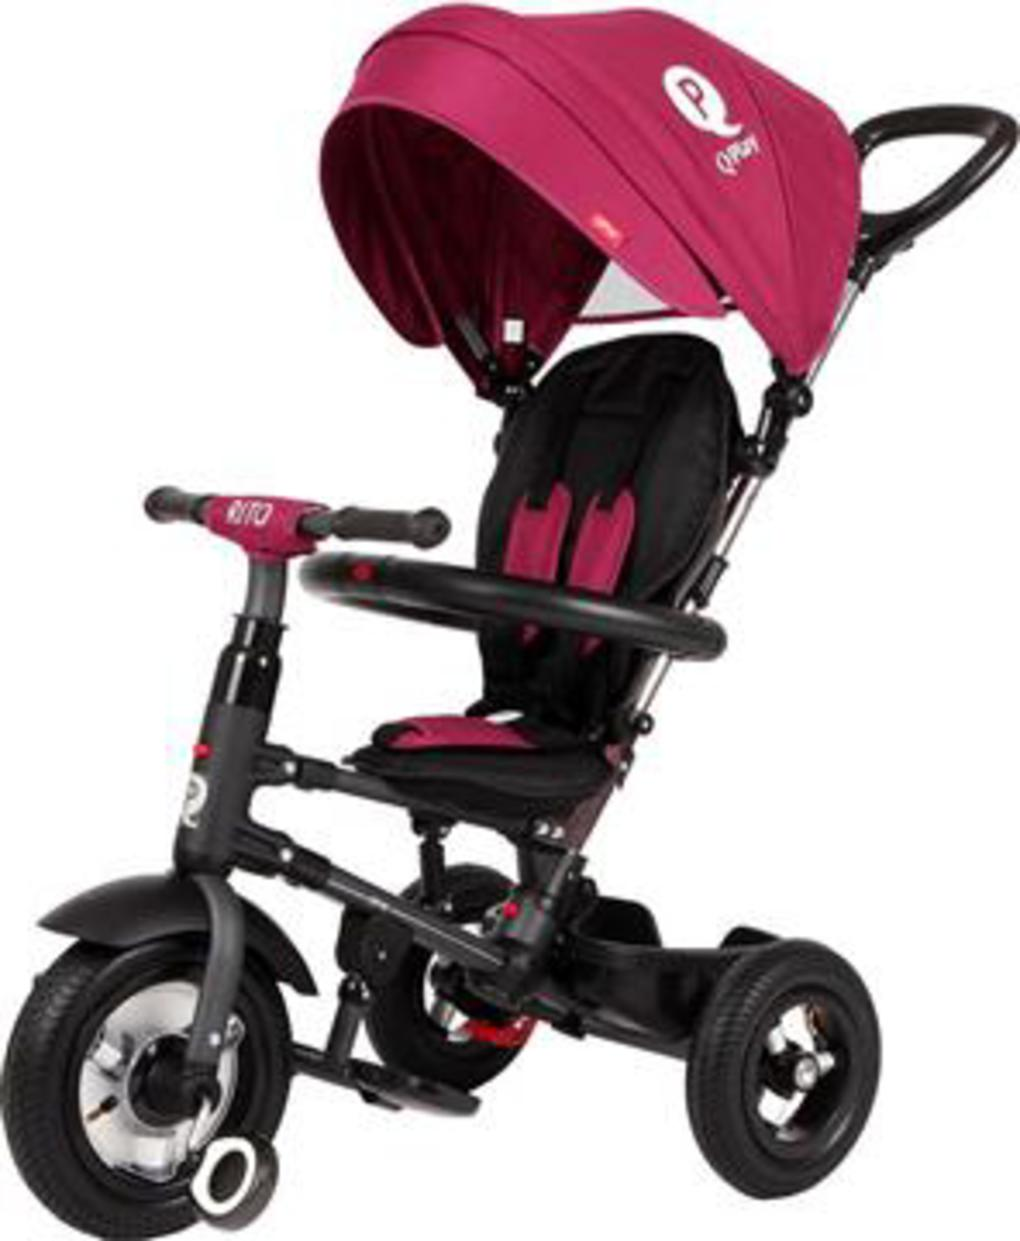 QPlay Rito Τρίκυκλο Air Wheels Purple (01-1212040-05)